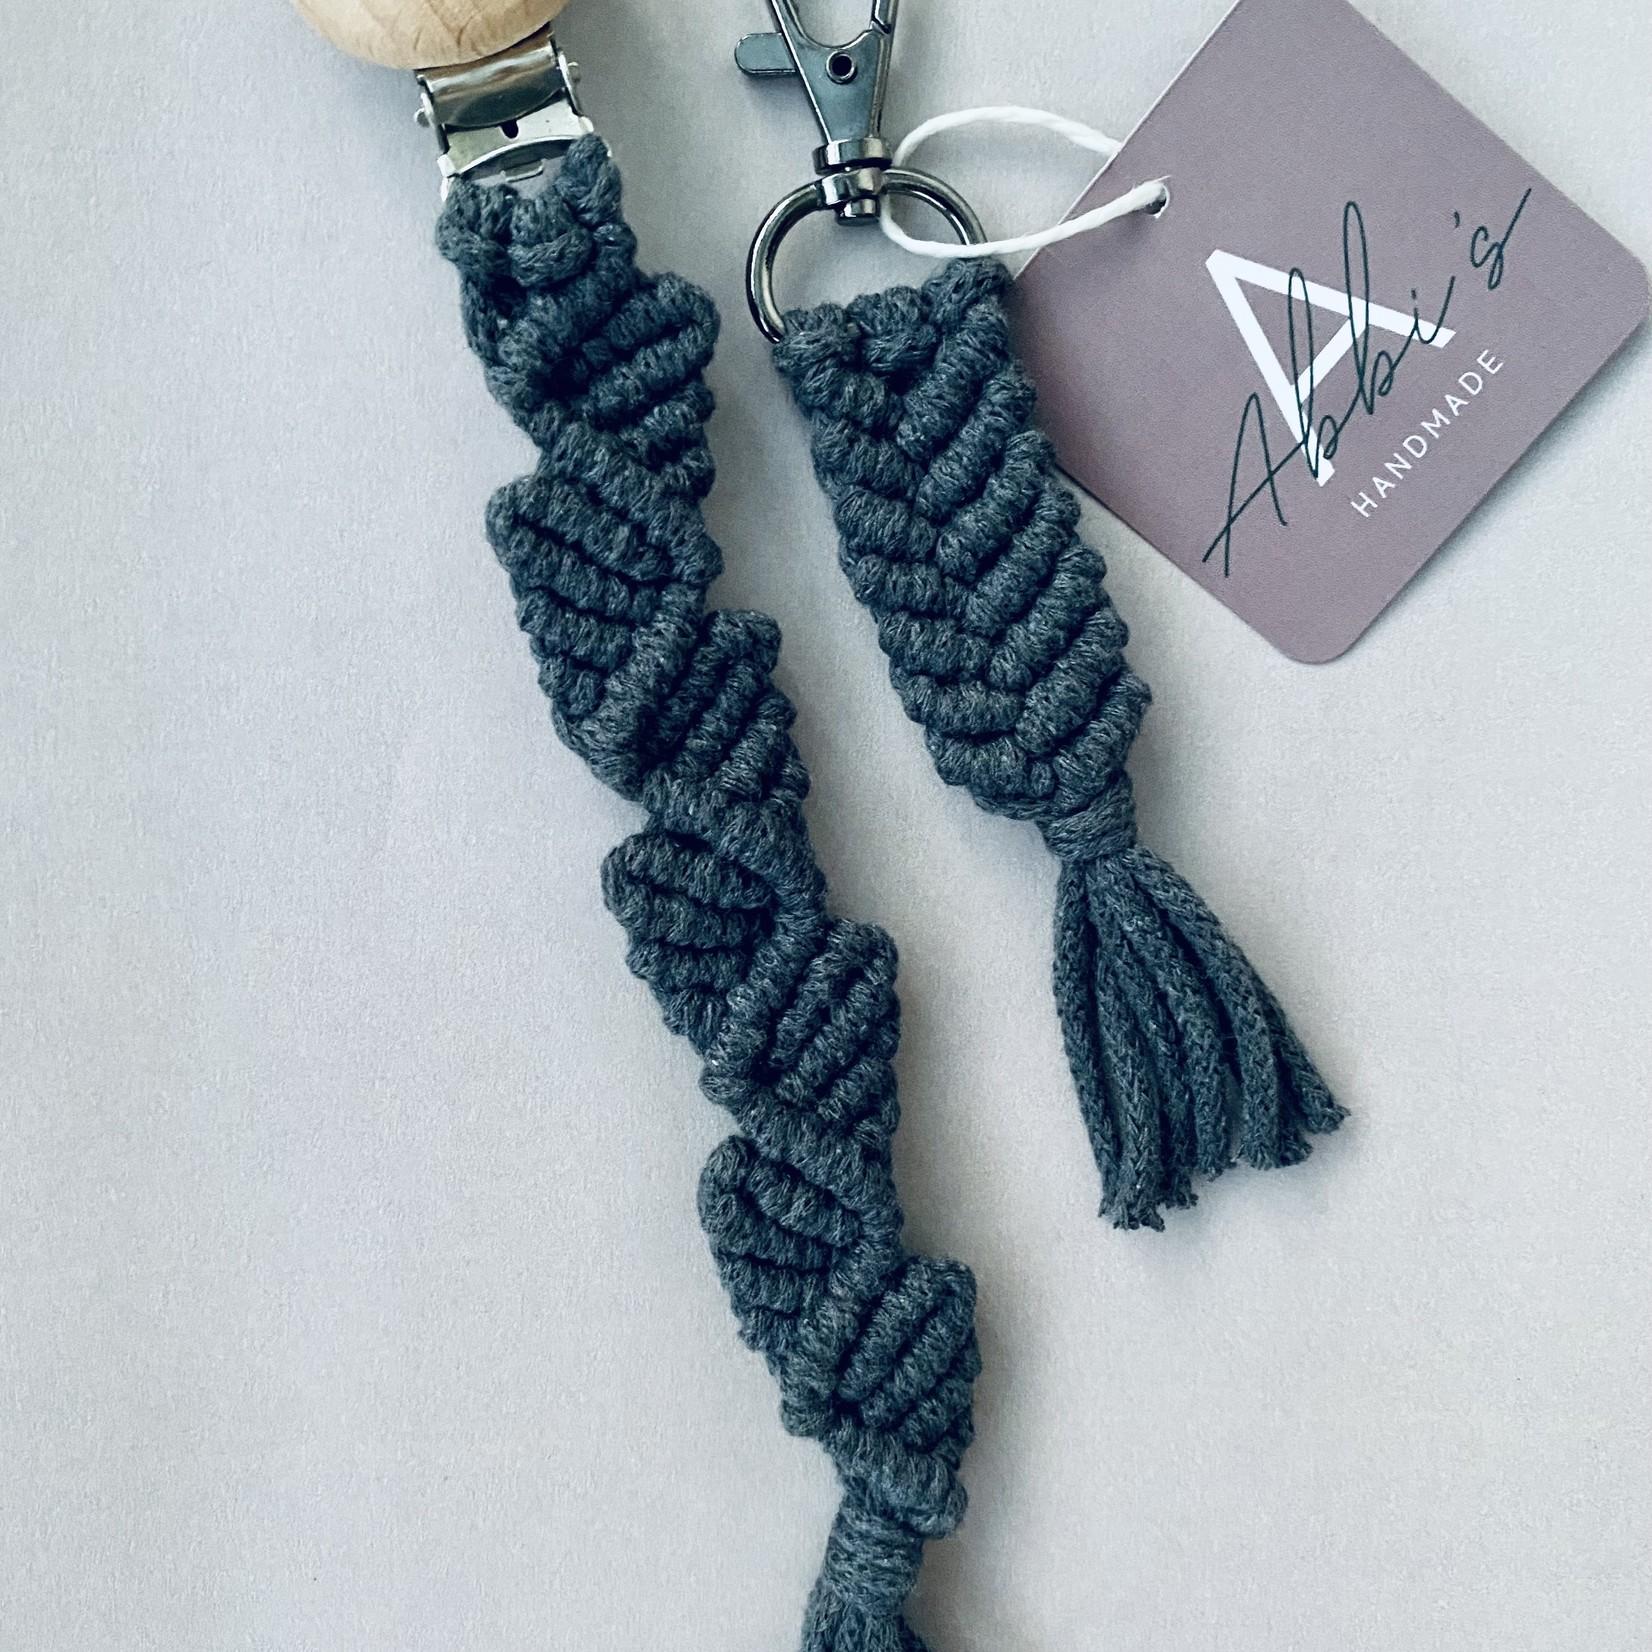 Abbi's Handmade Macramé Giftset - Charcoal